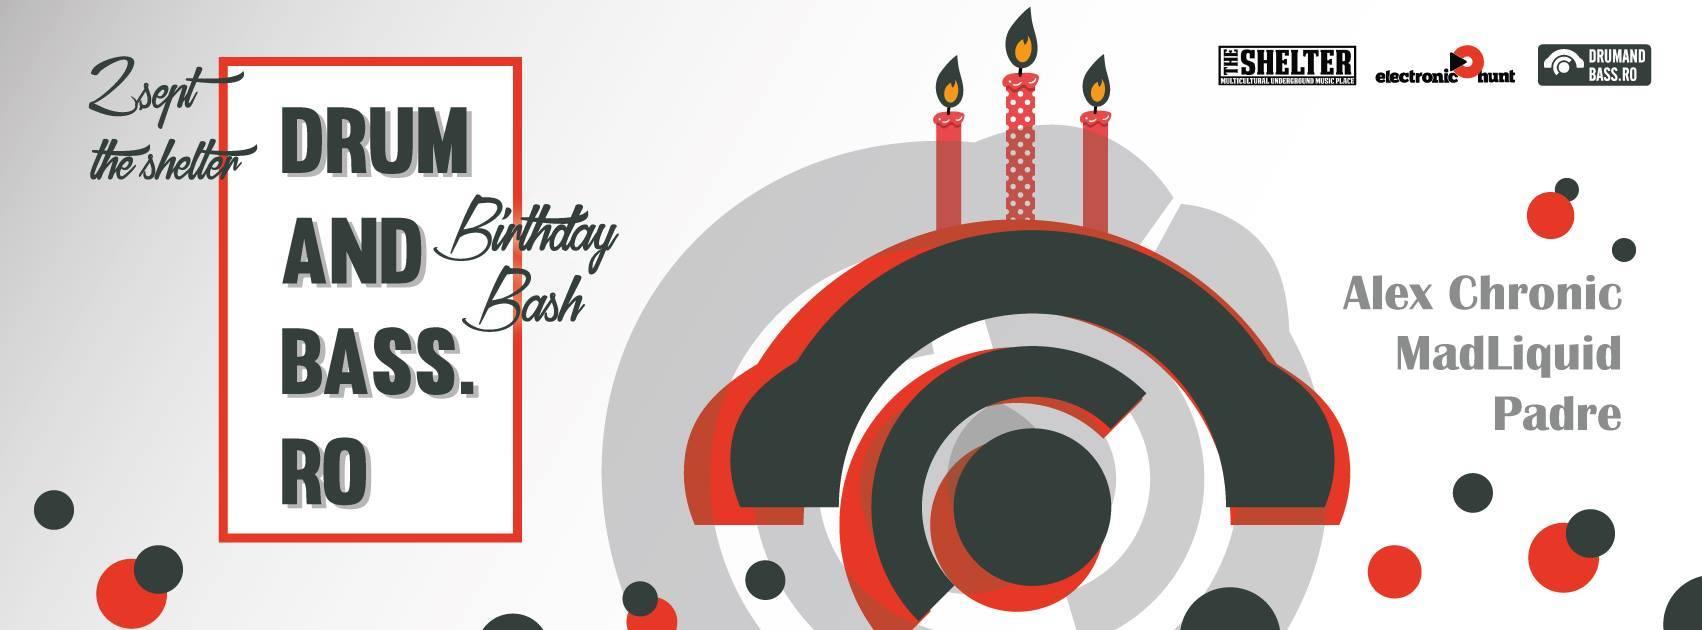 DrumAndBass.ro Birthday Bash @ The Shelter